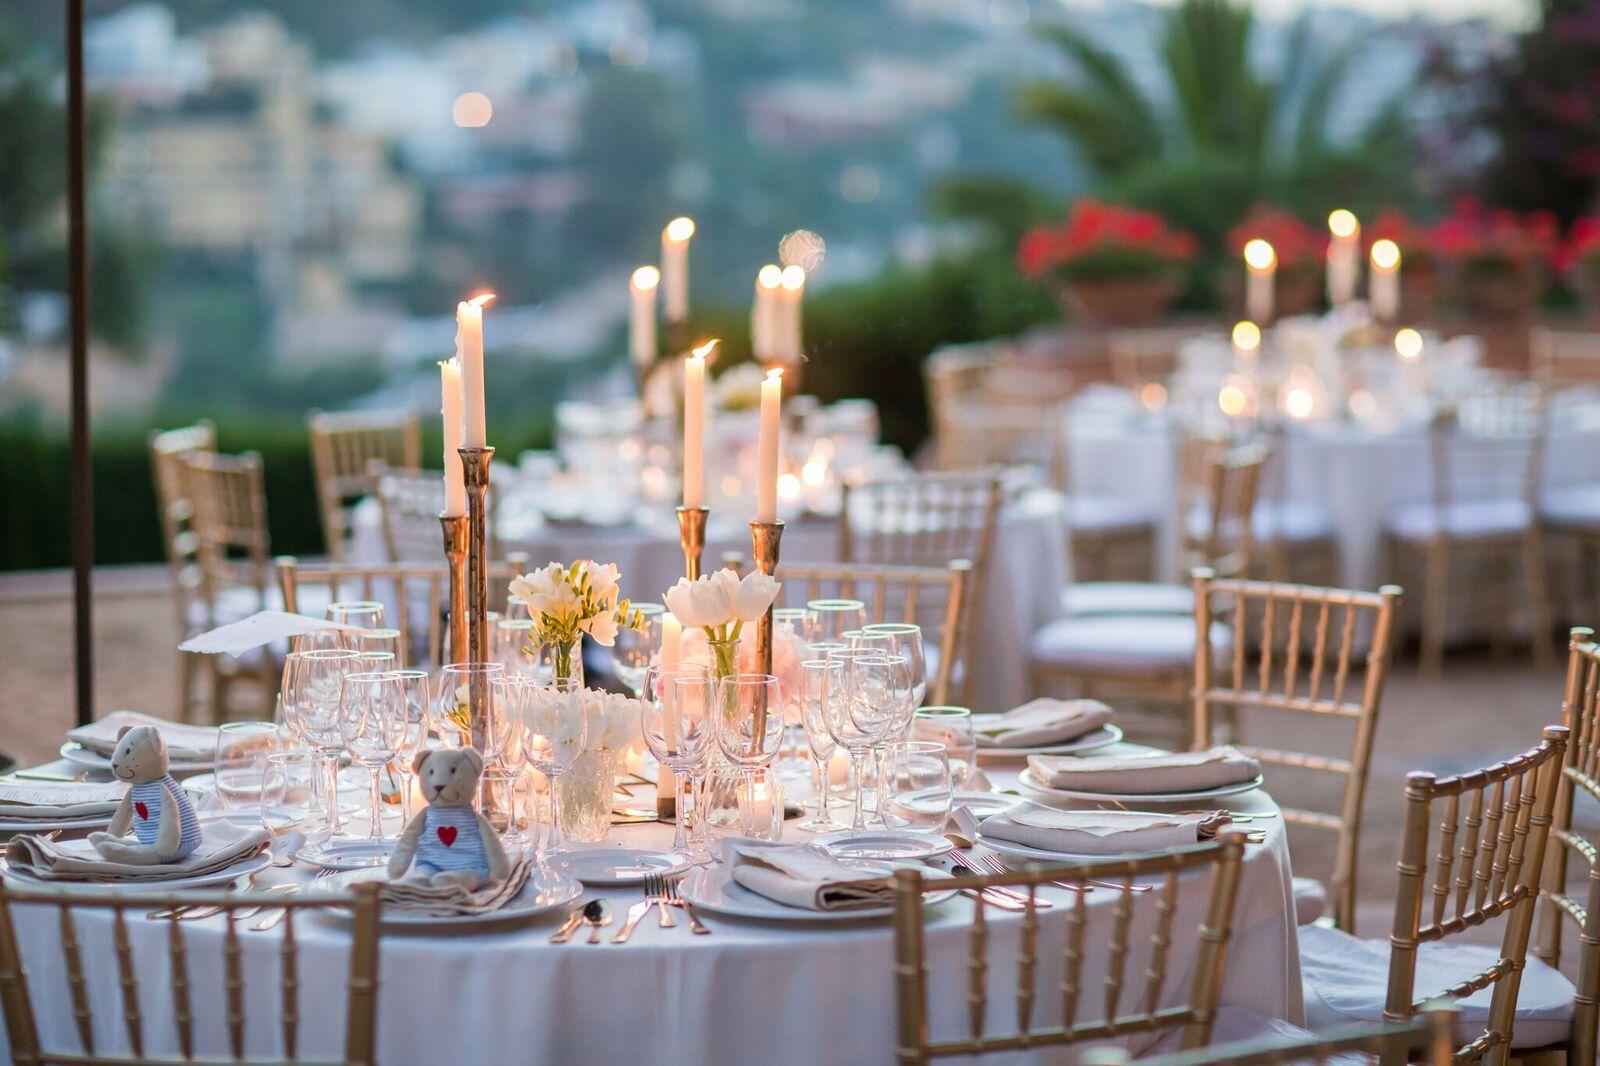 Si-Quiero-Wedding-Planner-Sira-Antequera-Hiba-Max-027